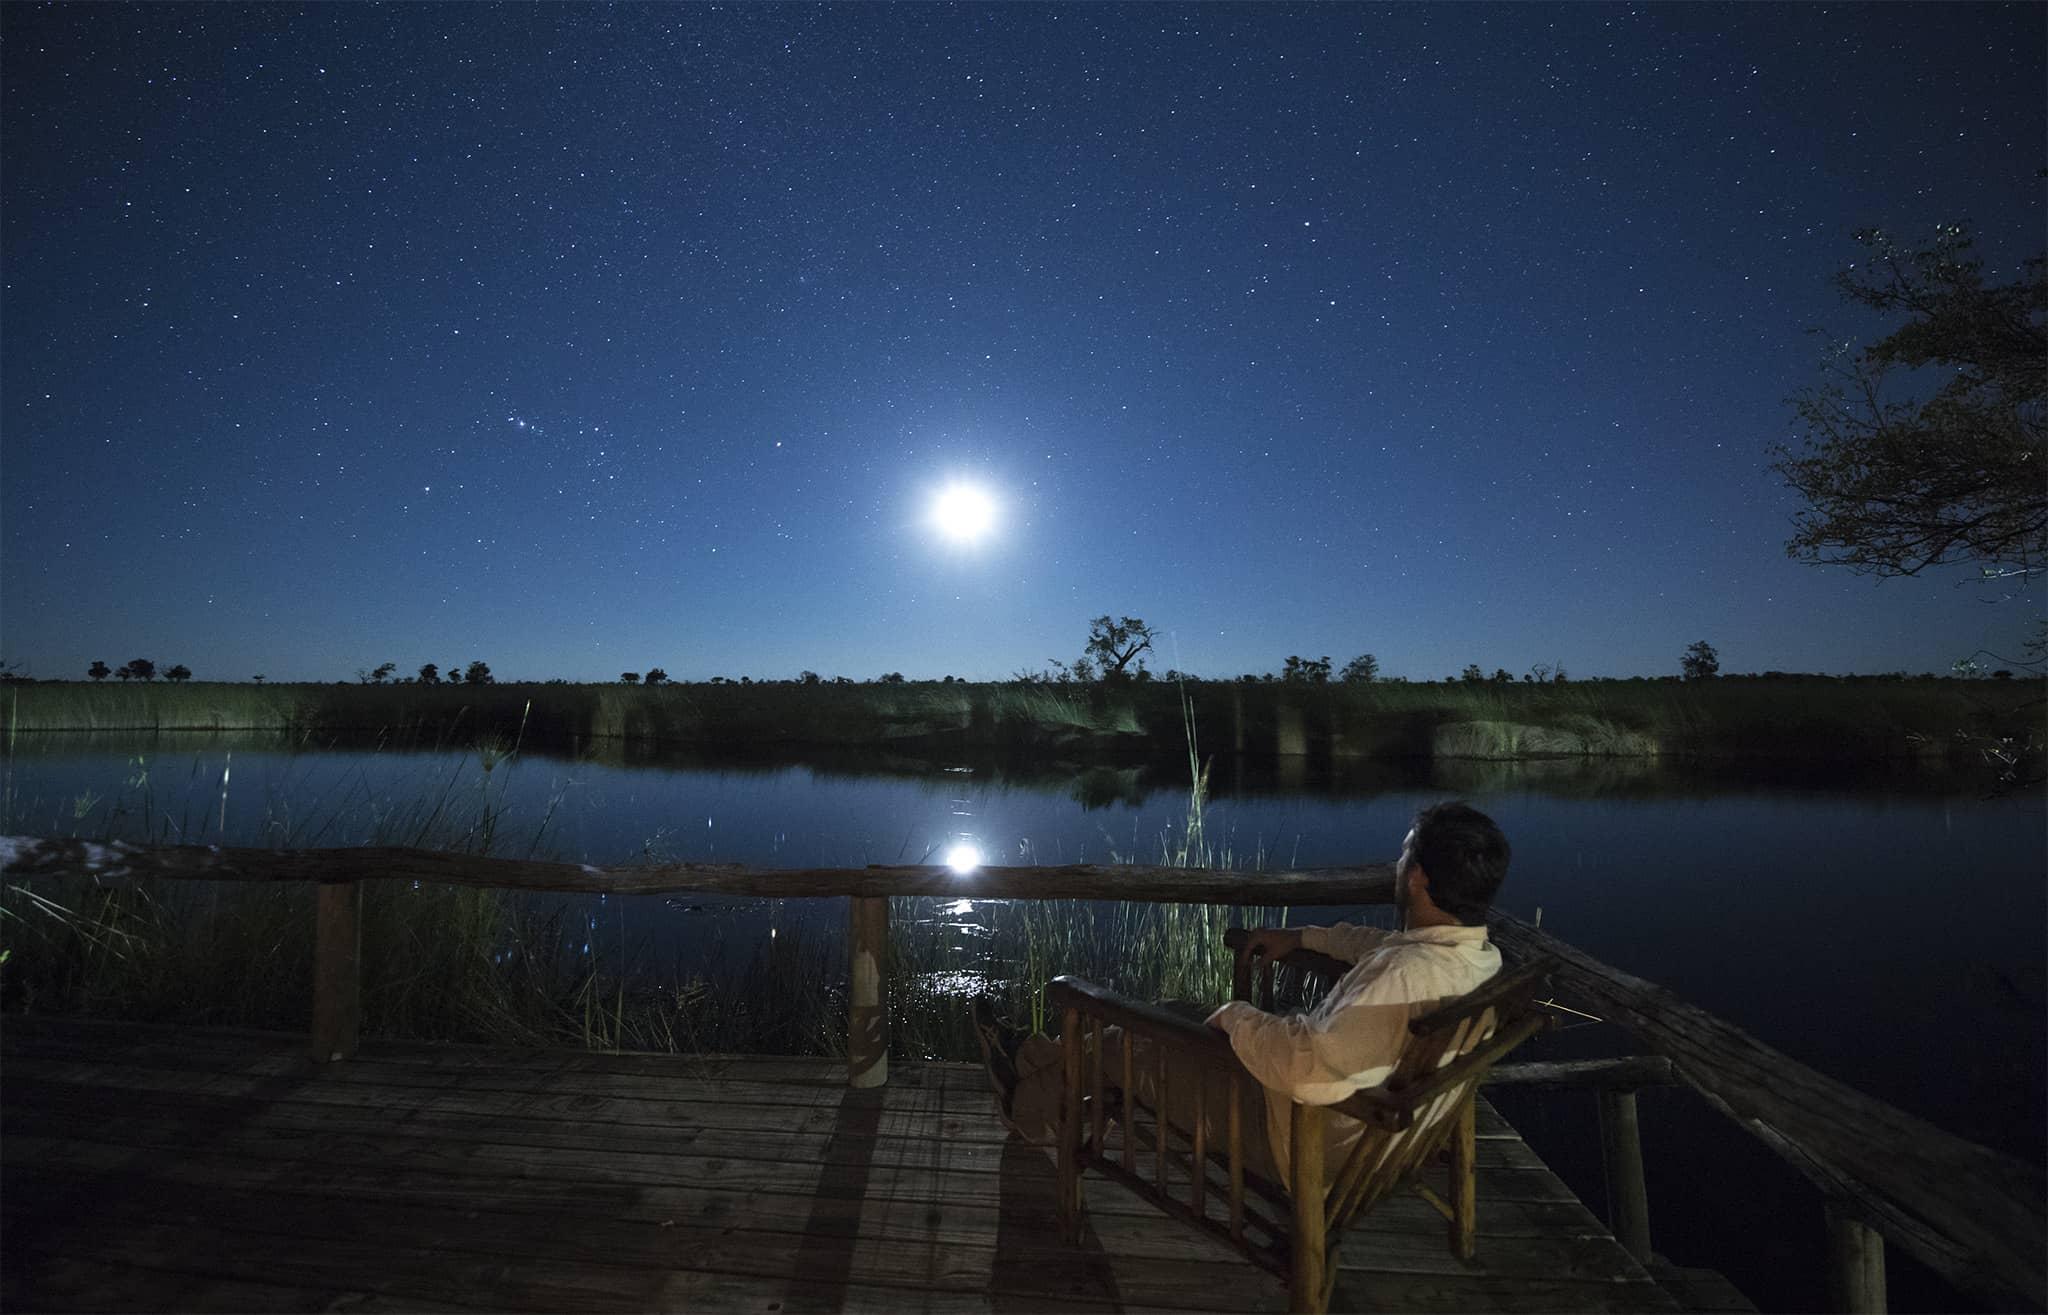 botswana moremi okovango delta full moon long exposure stars